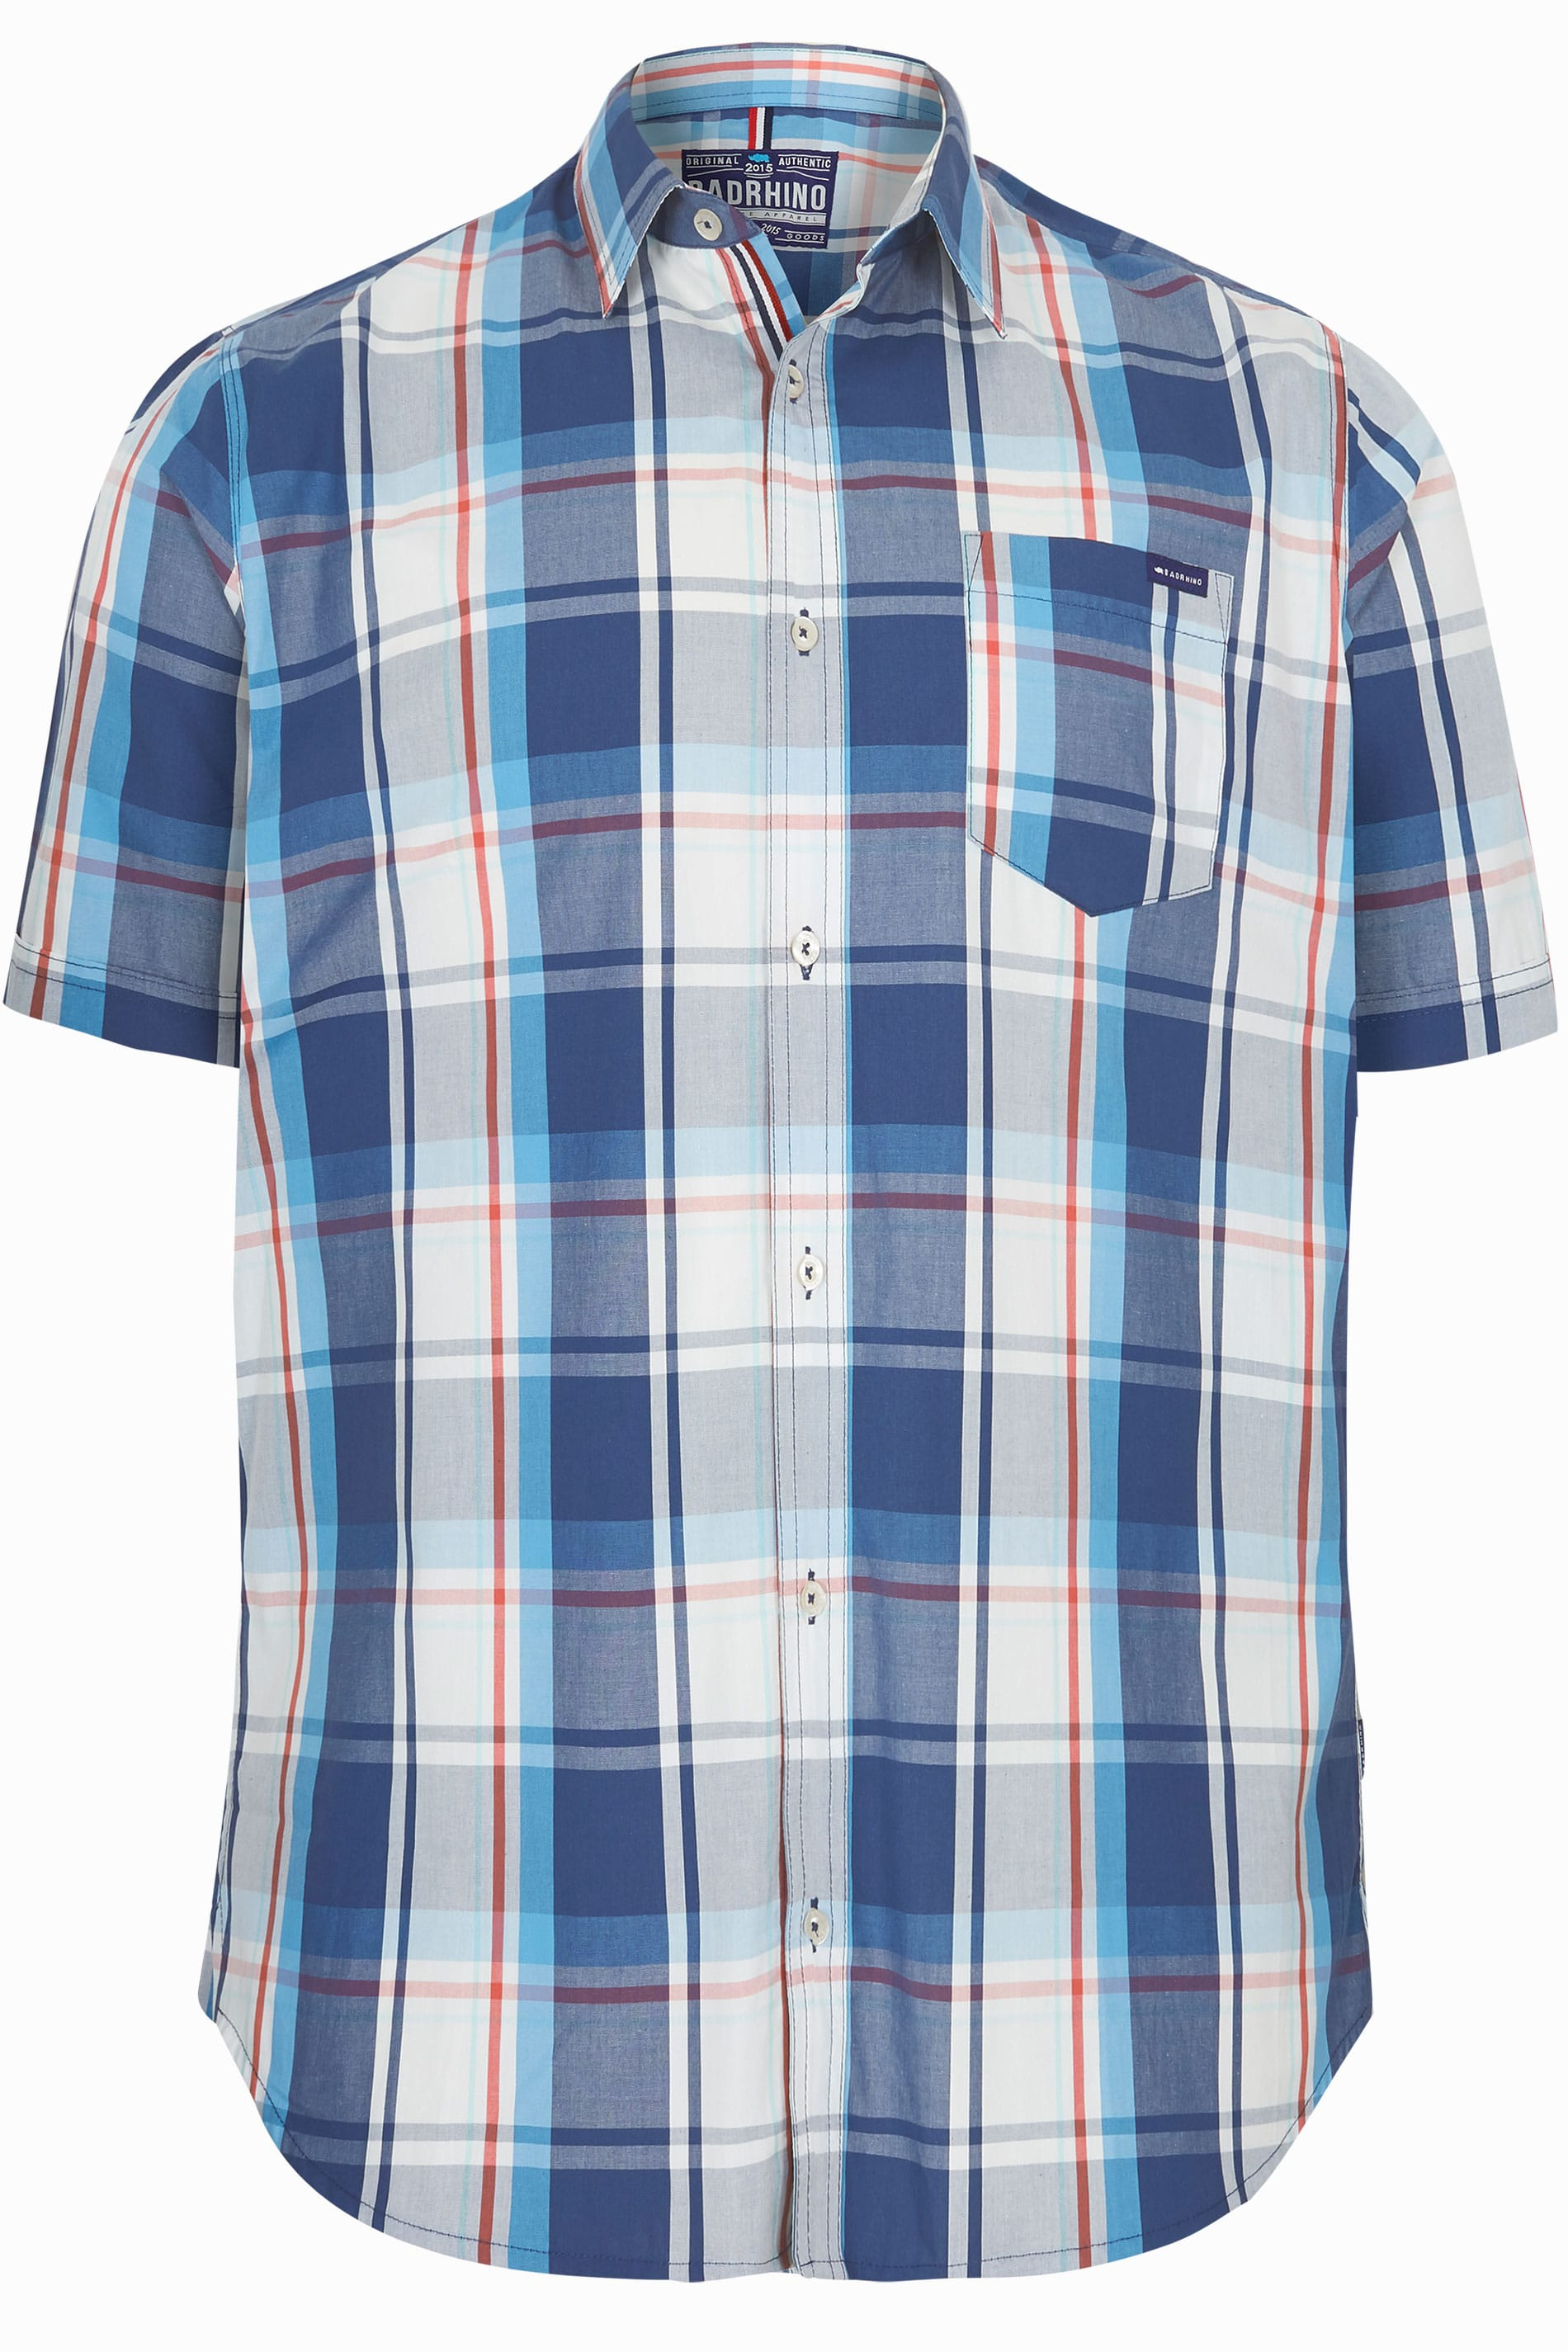 BadRhino Turquoise Blue Check Short Sleeve Shirt